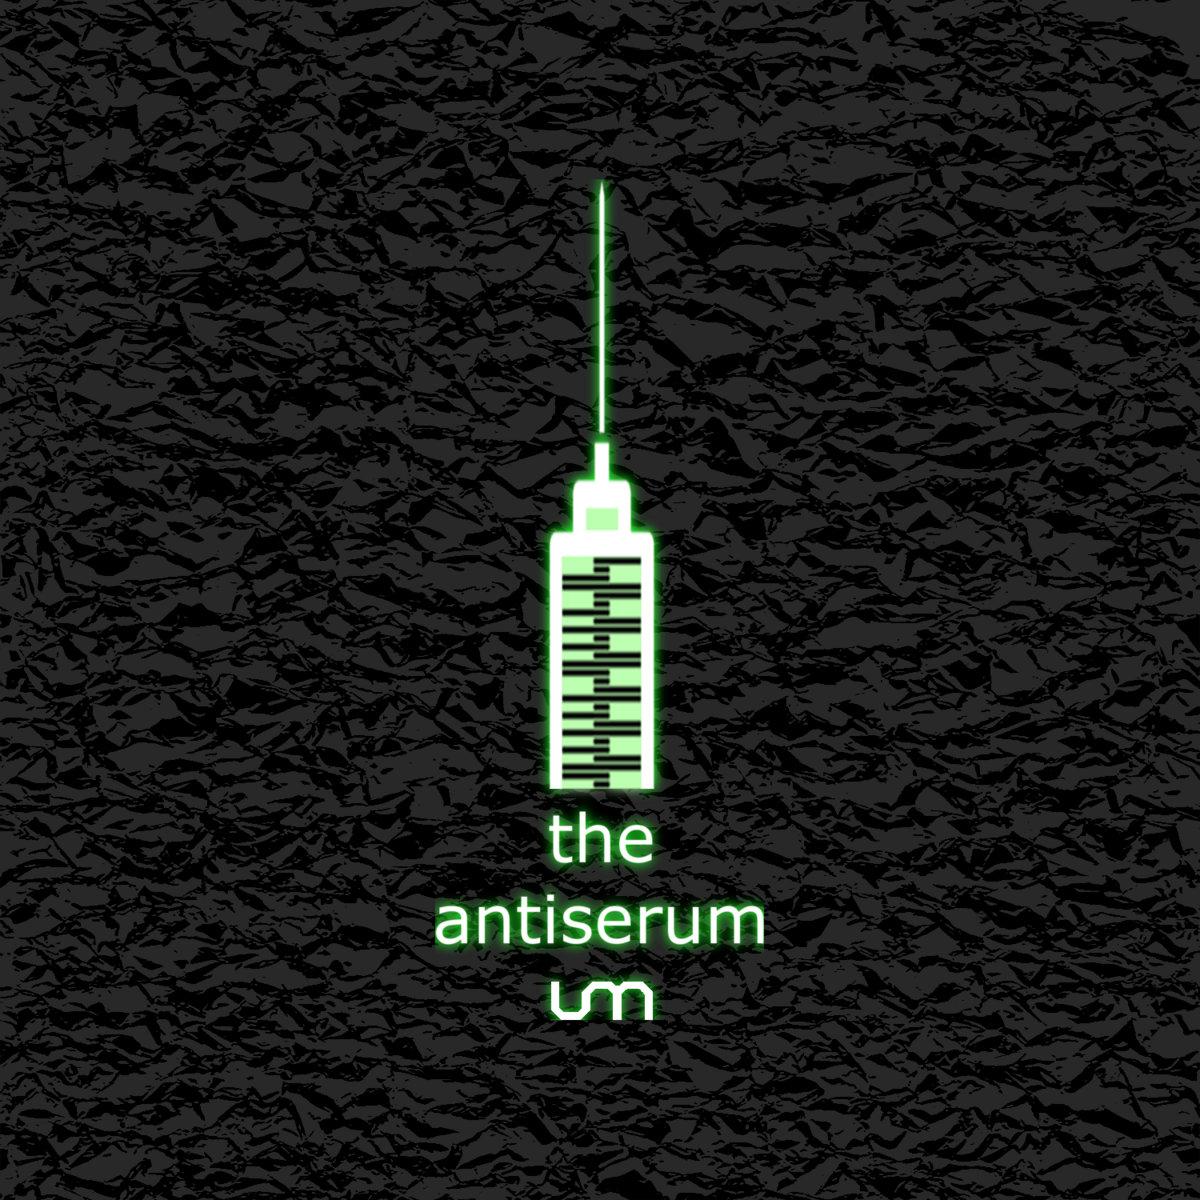 U-Manoyed - The Antiserum - U-Manoyed - The Antiserum